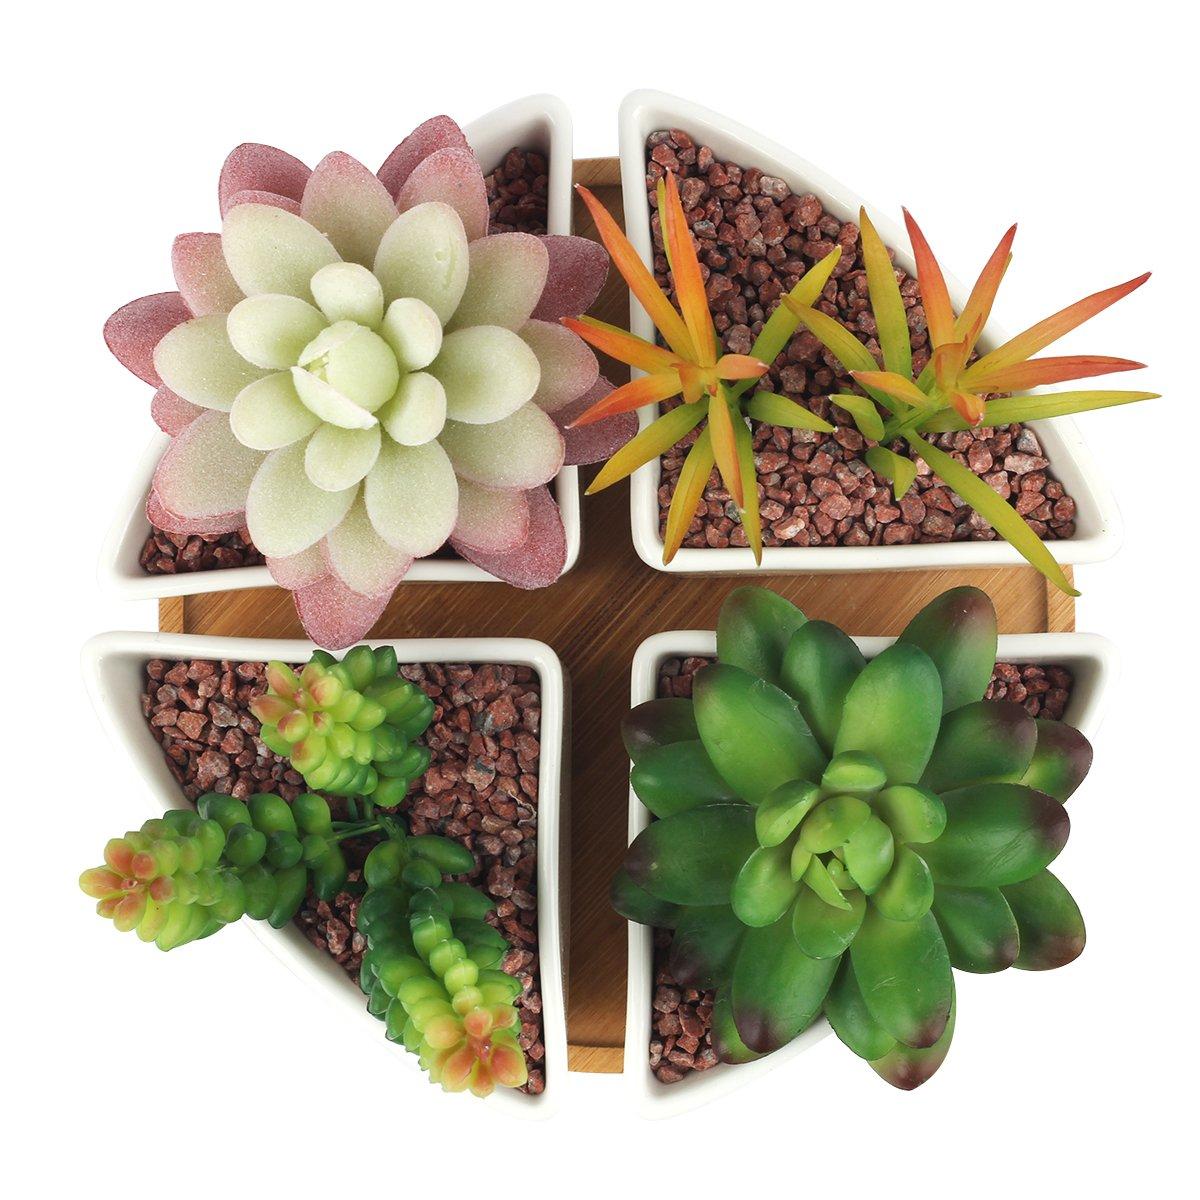 Innoter Succulent Planter Modern White Ceramic Cactus Flower Pot